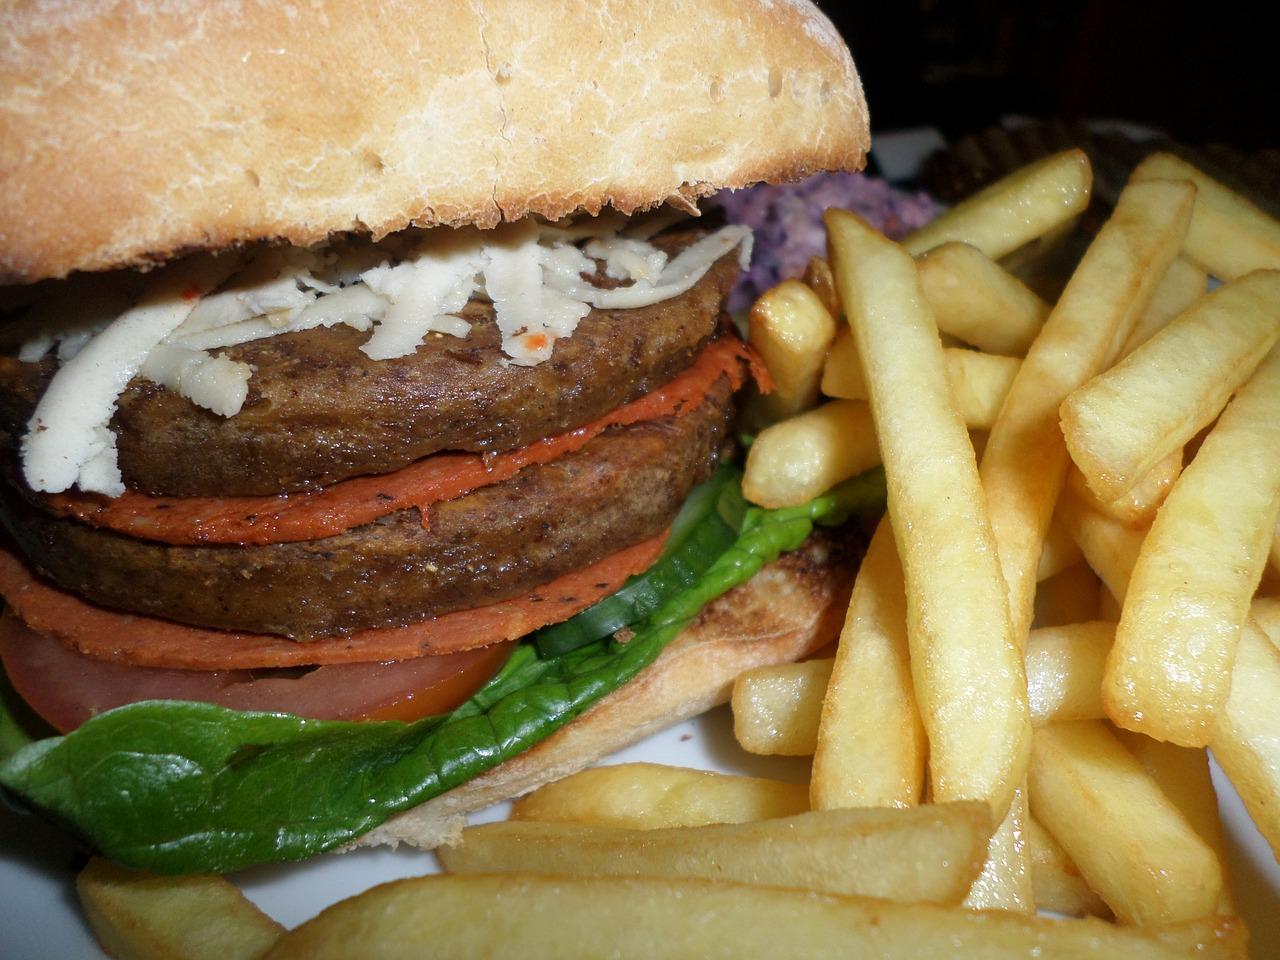 wpid-fast-food-398777_1280.jpg